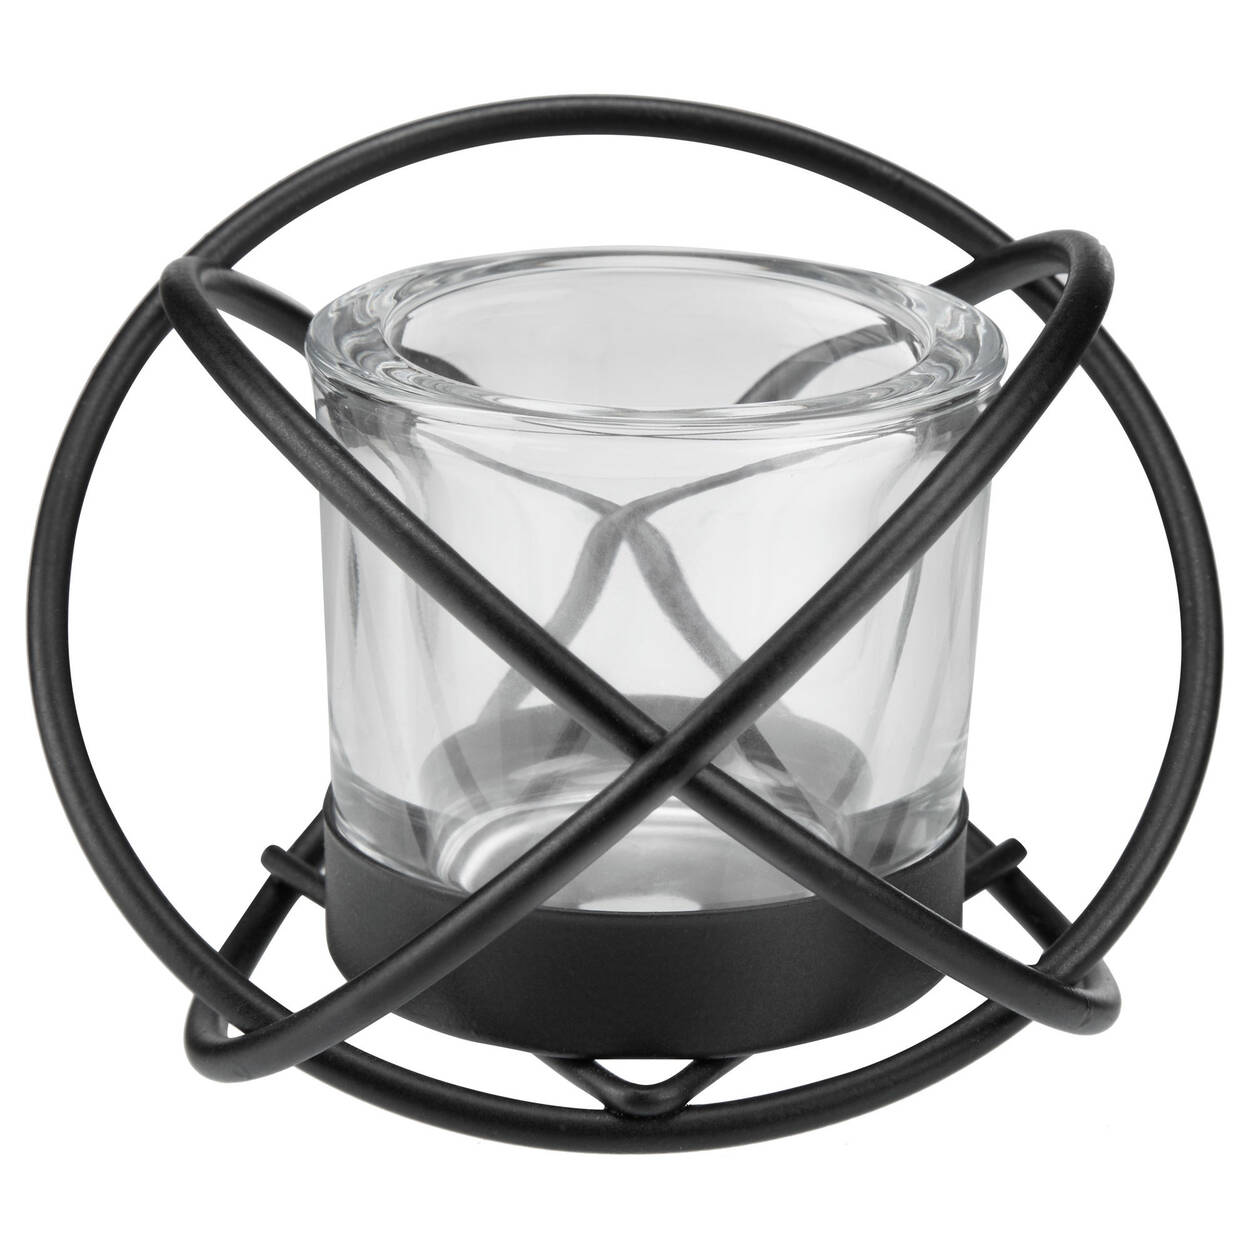 Porte bougie en tige de fer et en verre for Porte en fer et verre